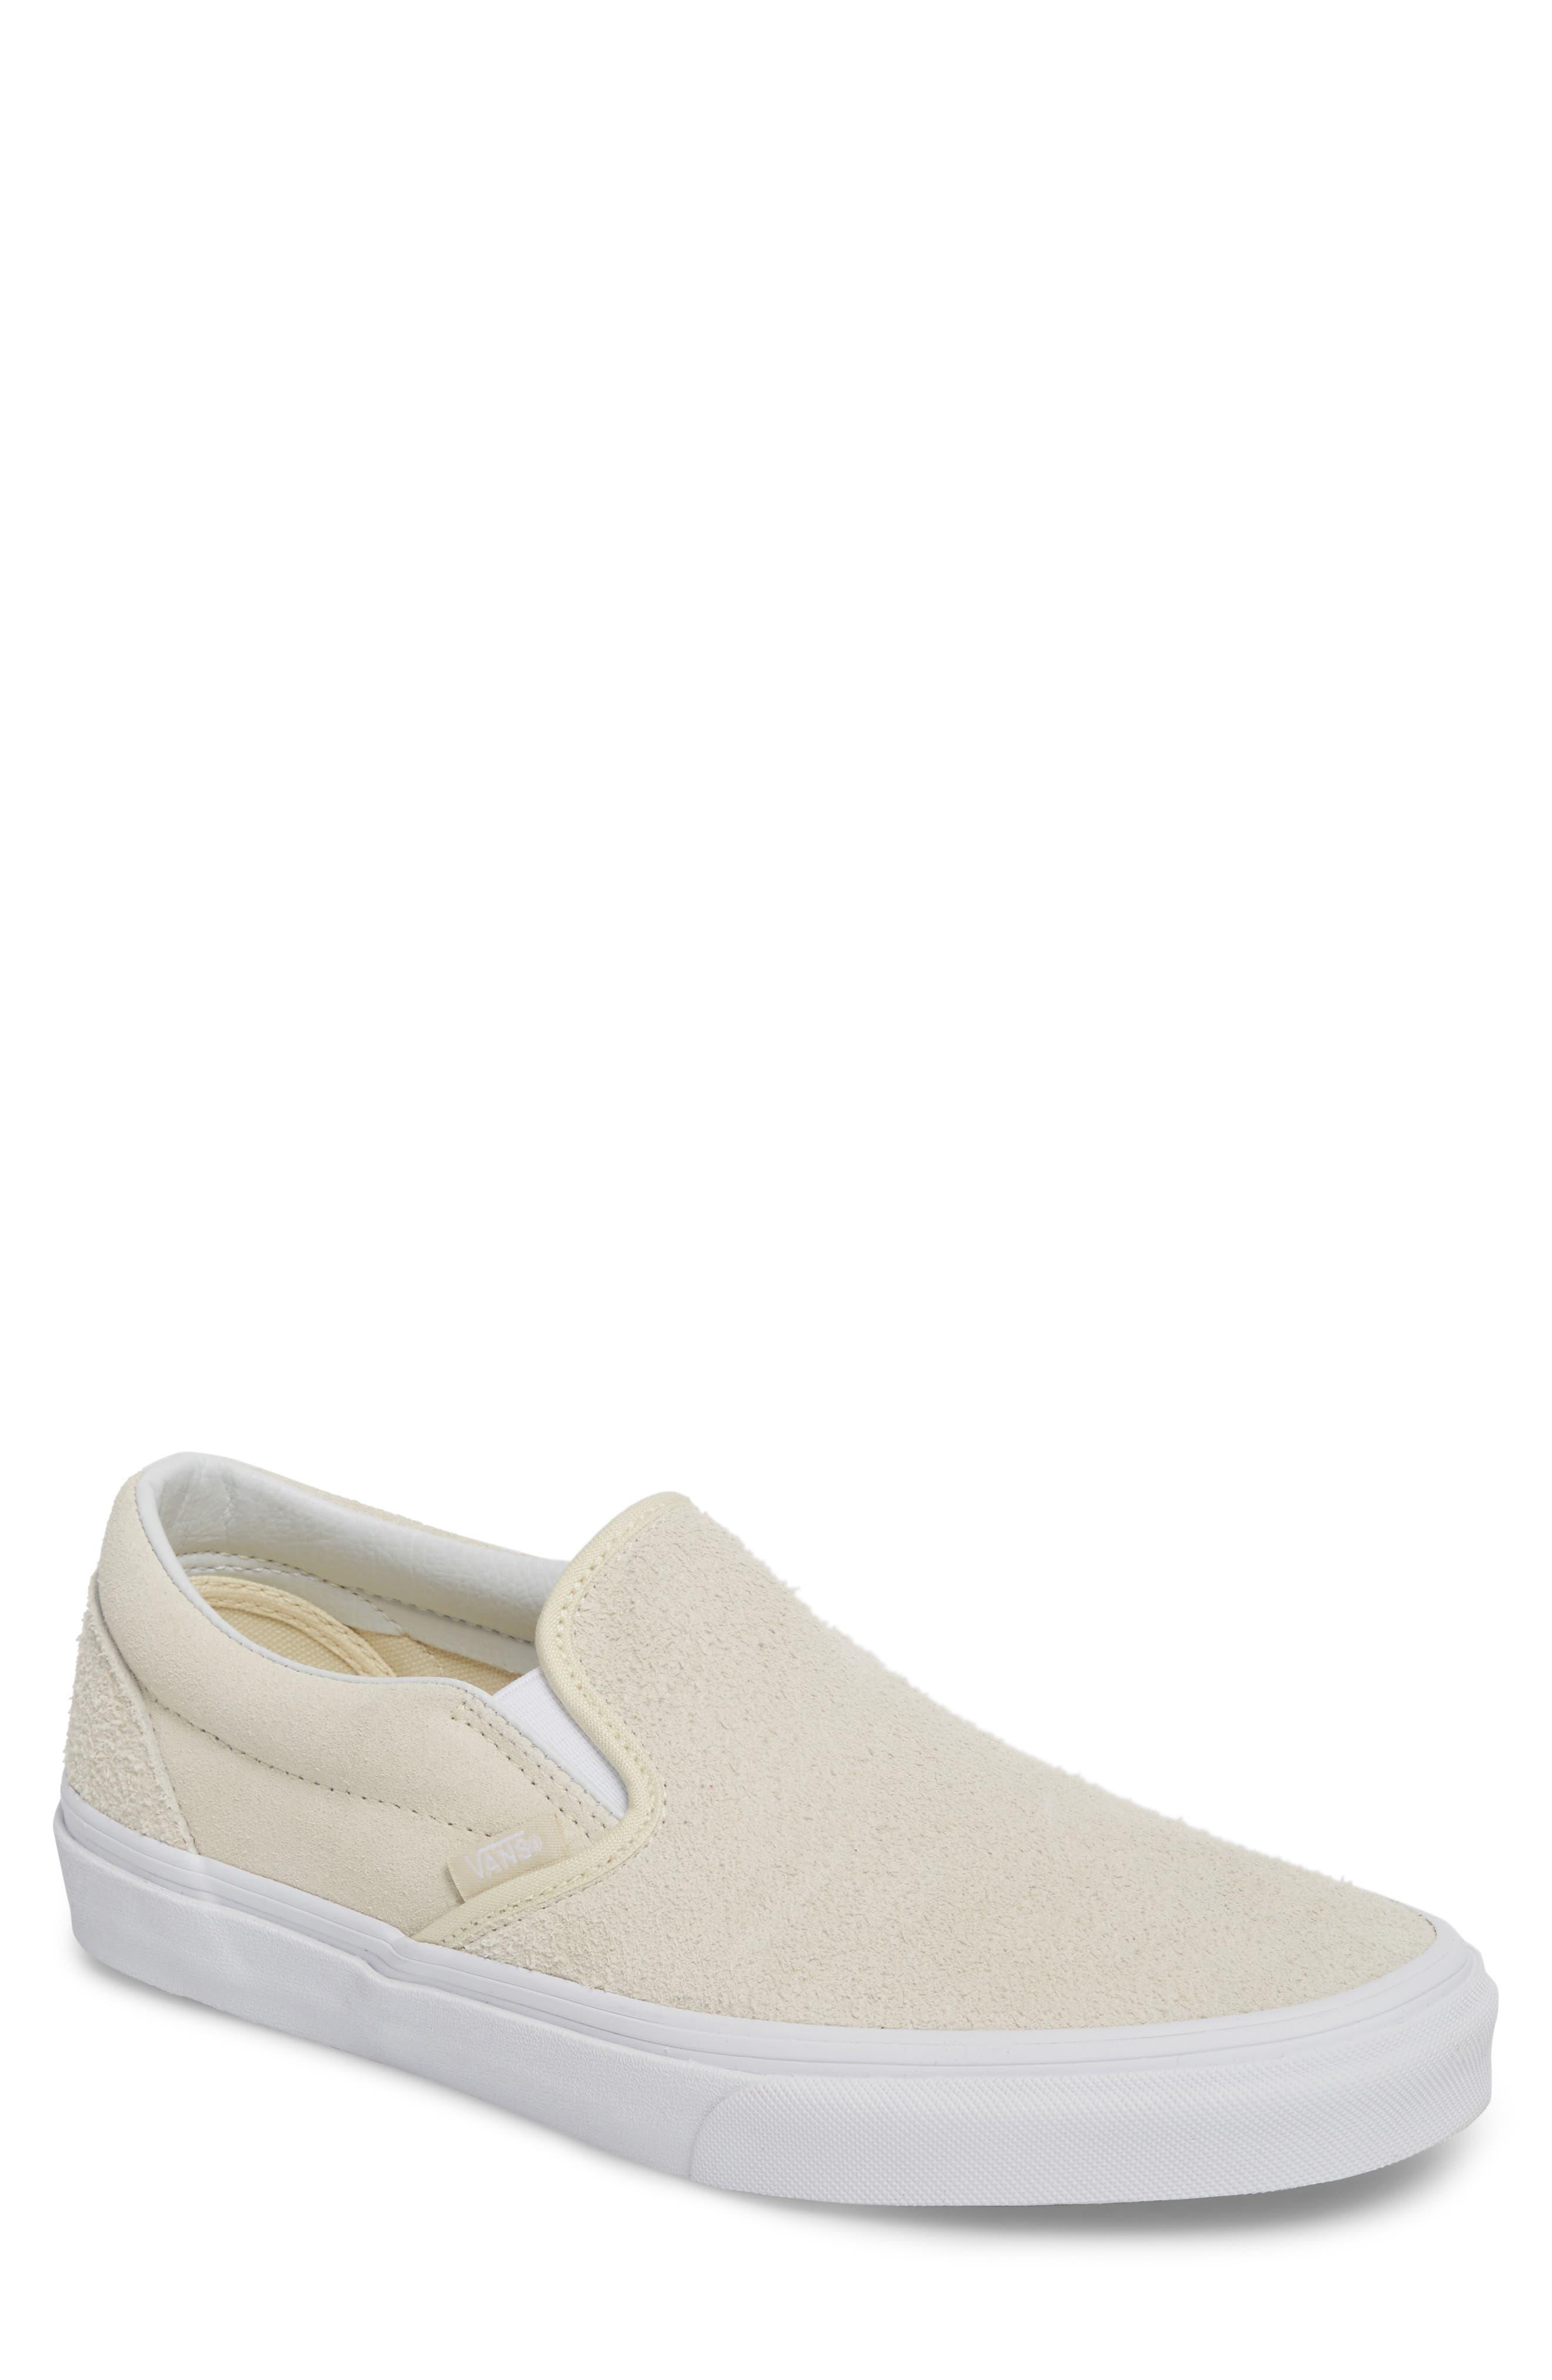 115d9c087c0 VANS Classic Hairy Suede Slip-On Sneaker